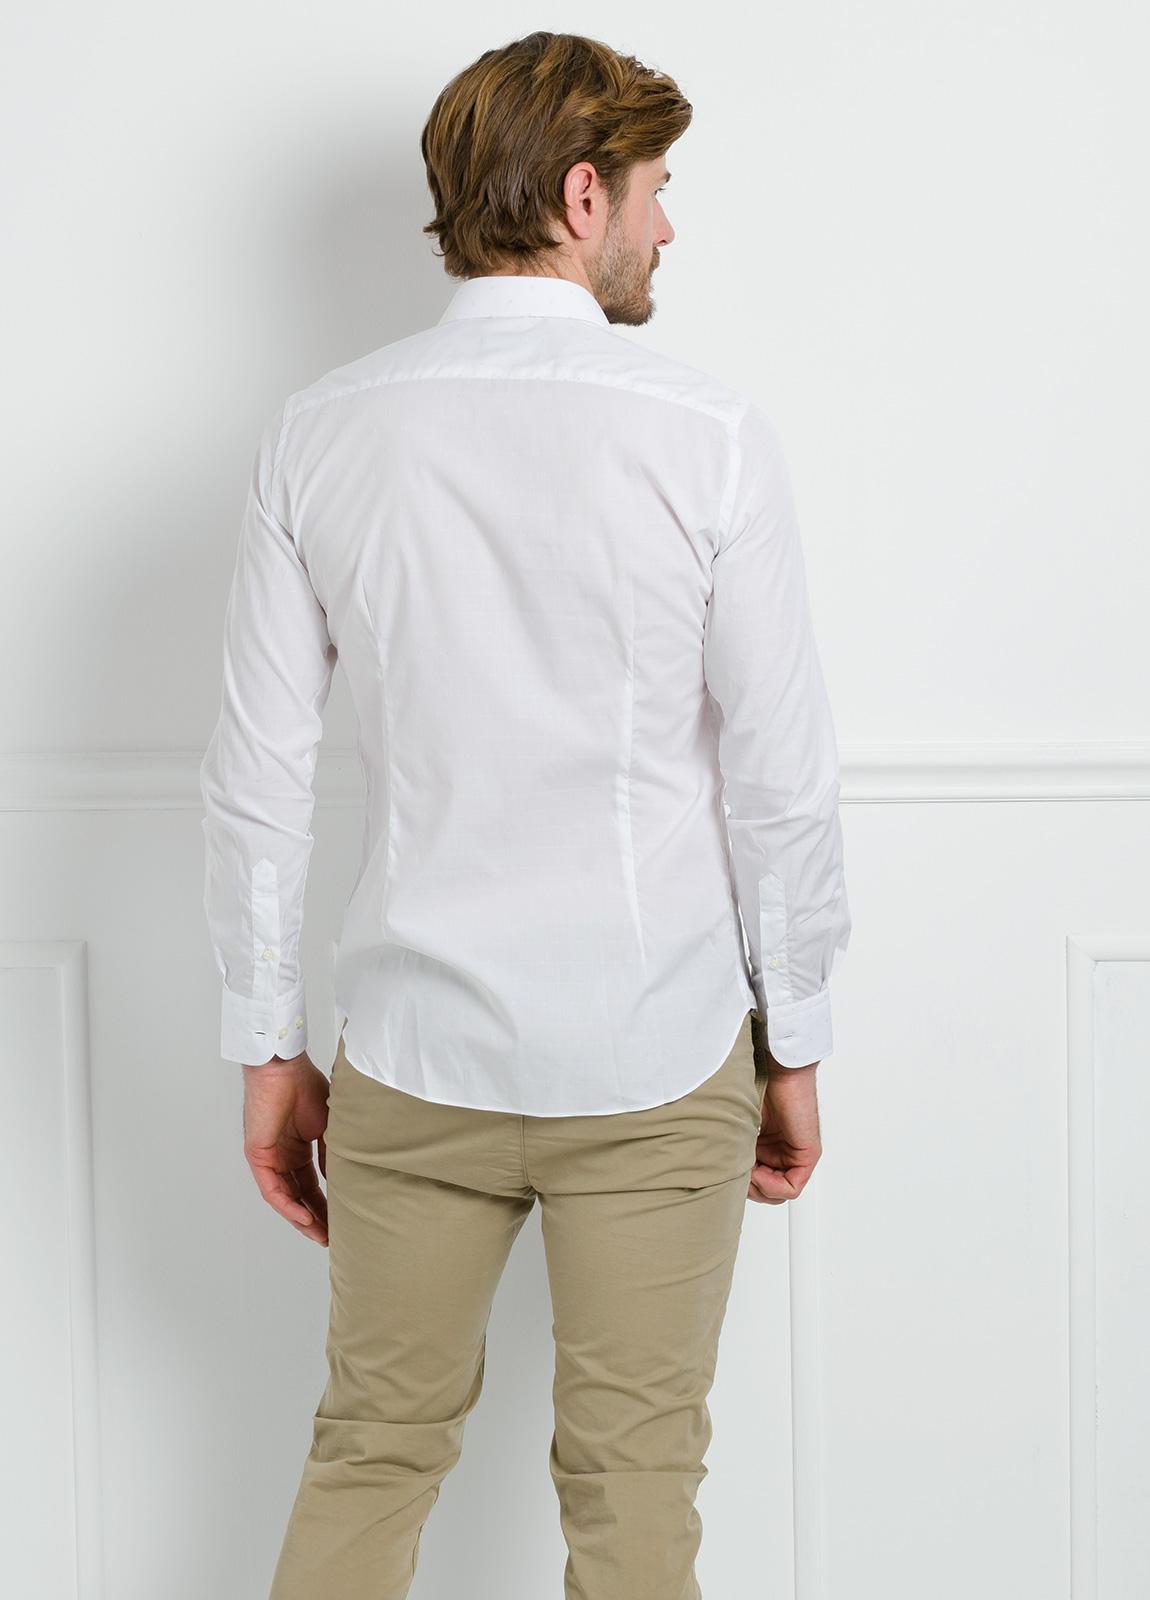 Camisa Formal Wear SLIM FIT cuello italiano modelo ROMA color blanco con micro dibujo color celeste. 100% Algodón. - Ítem2